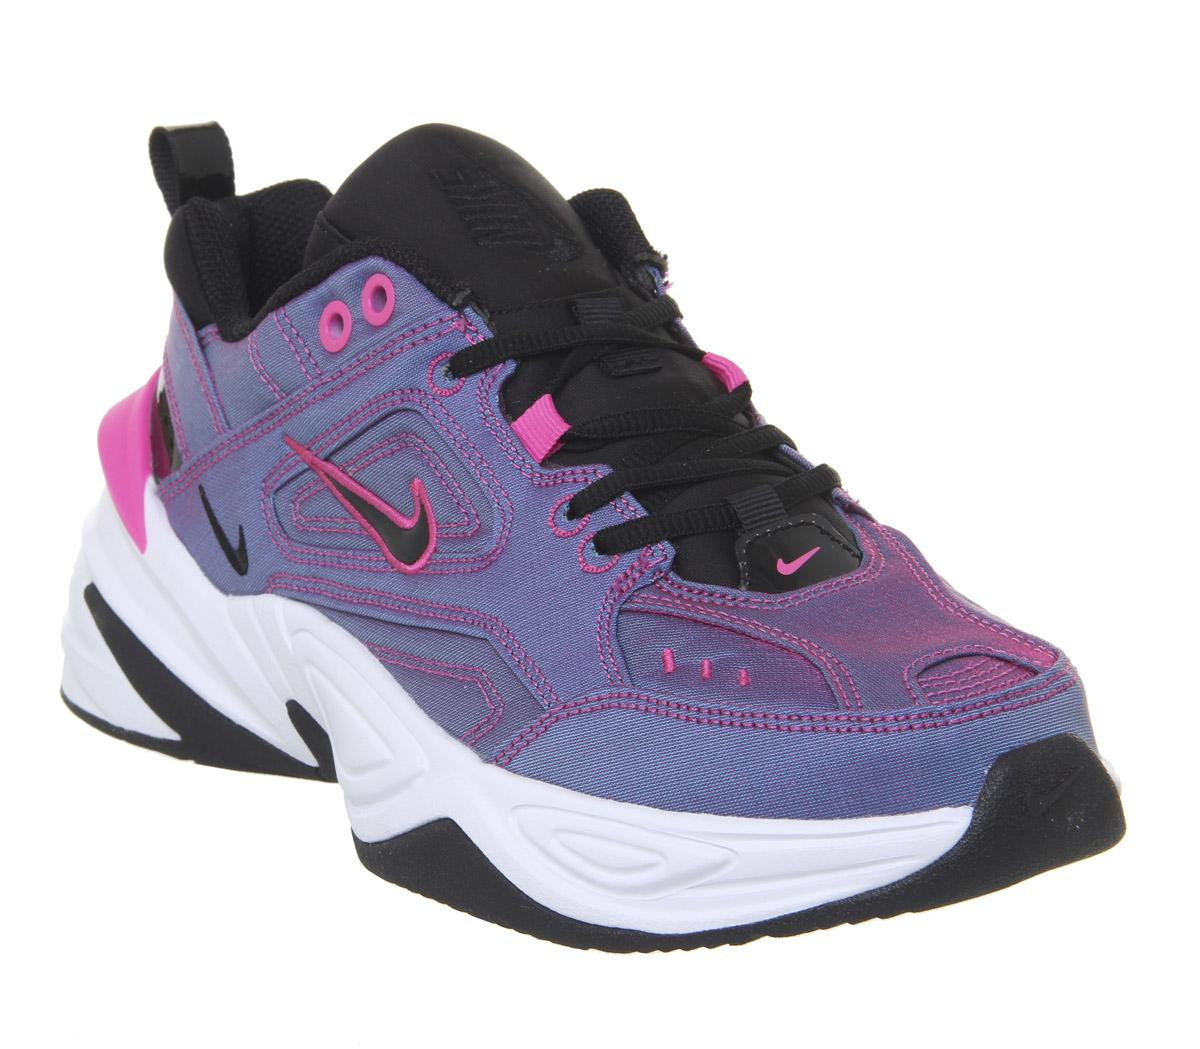 Nike M2k Tekno Laser Fuchsia Black